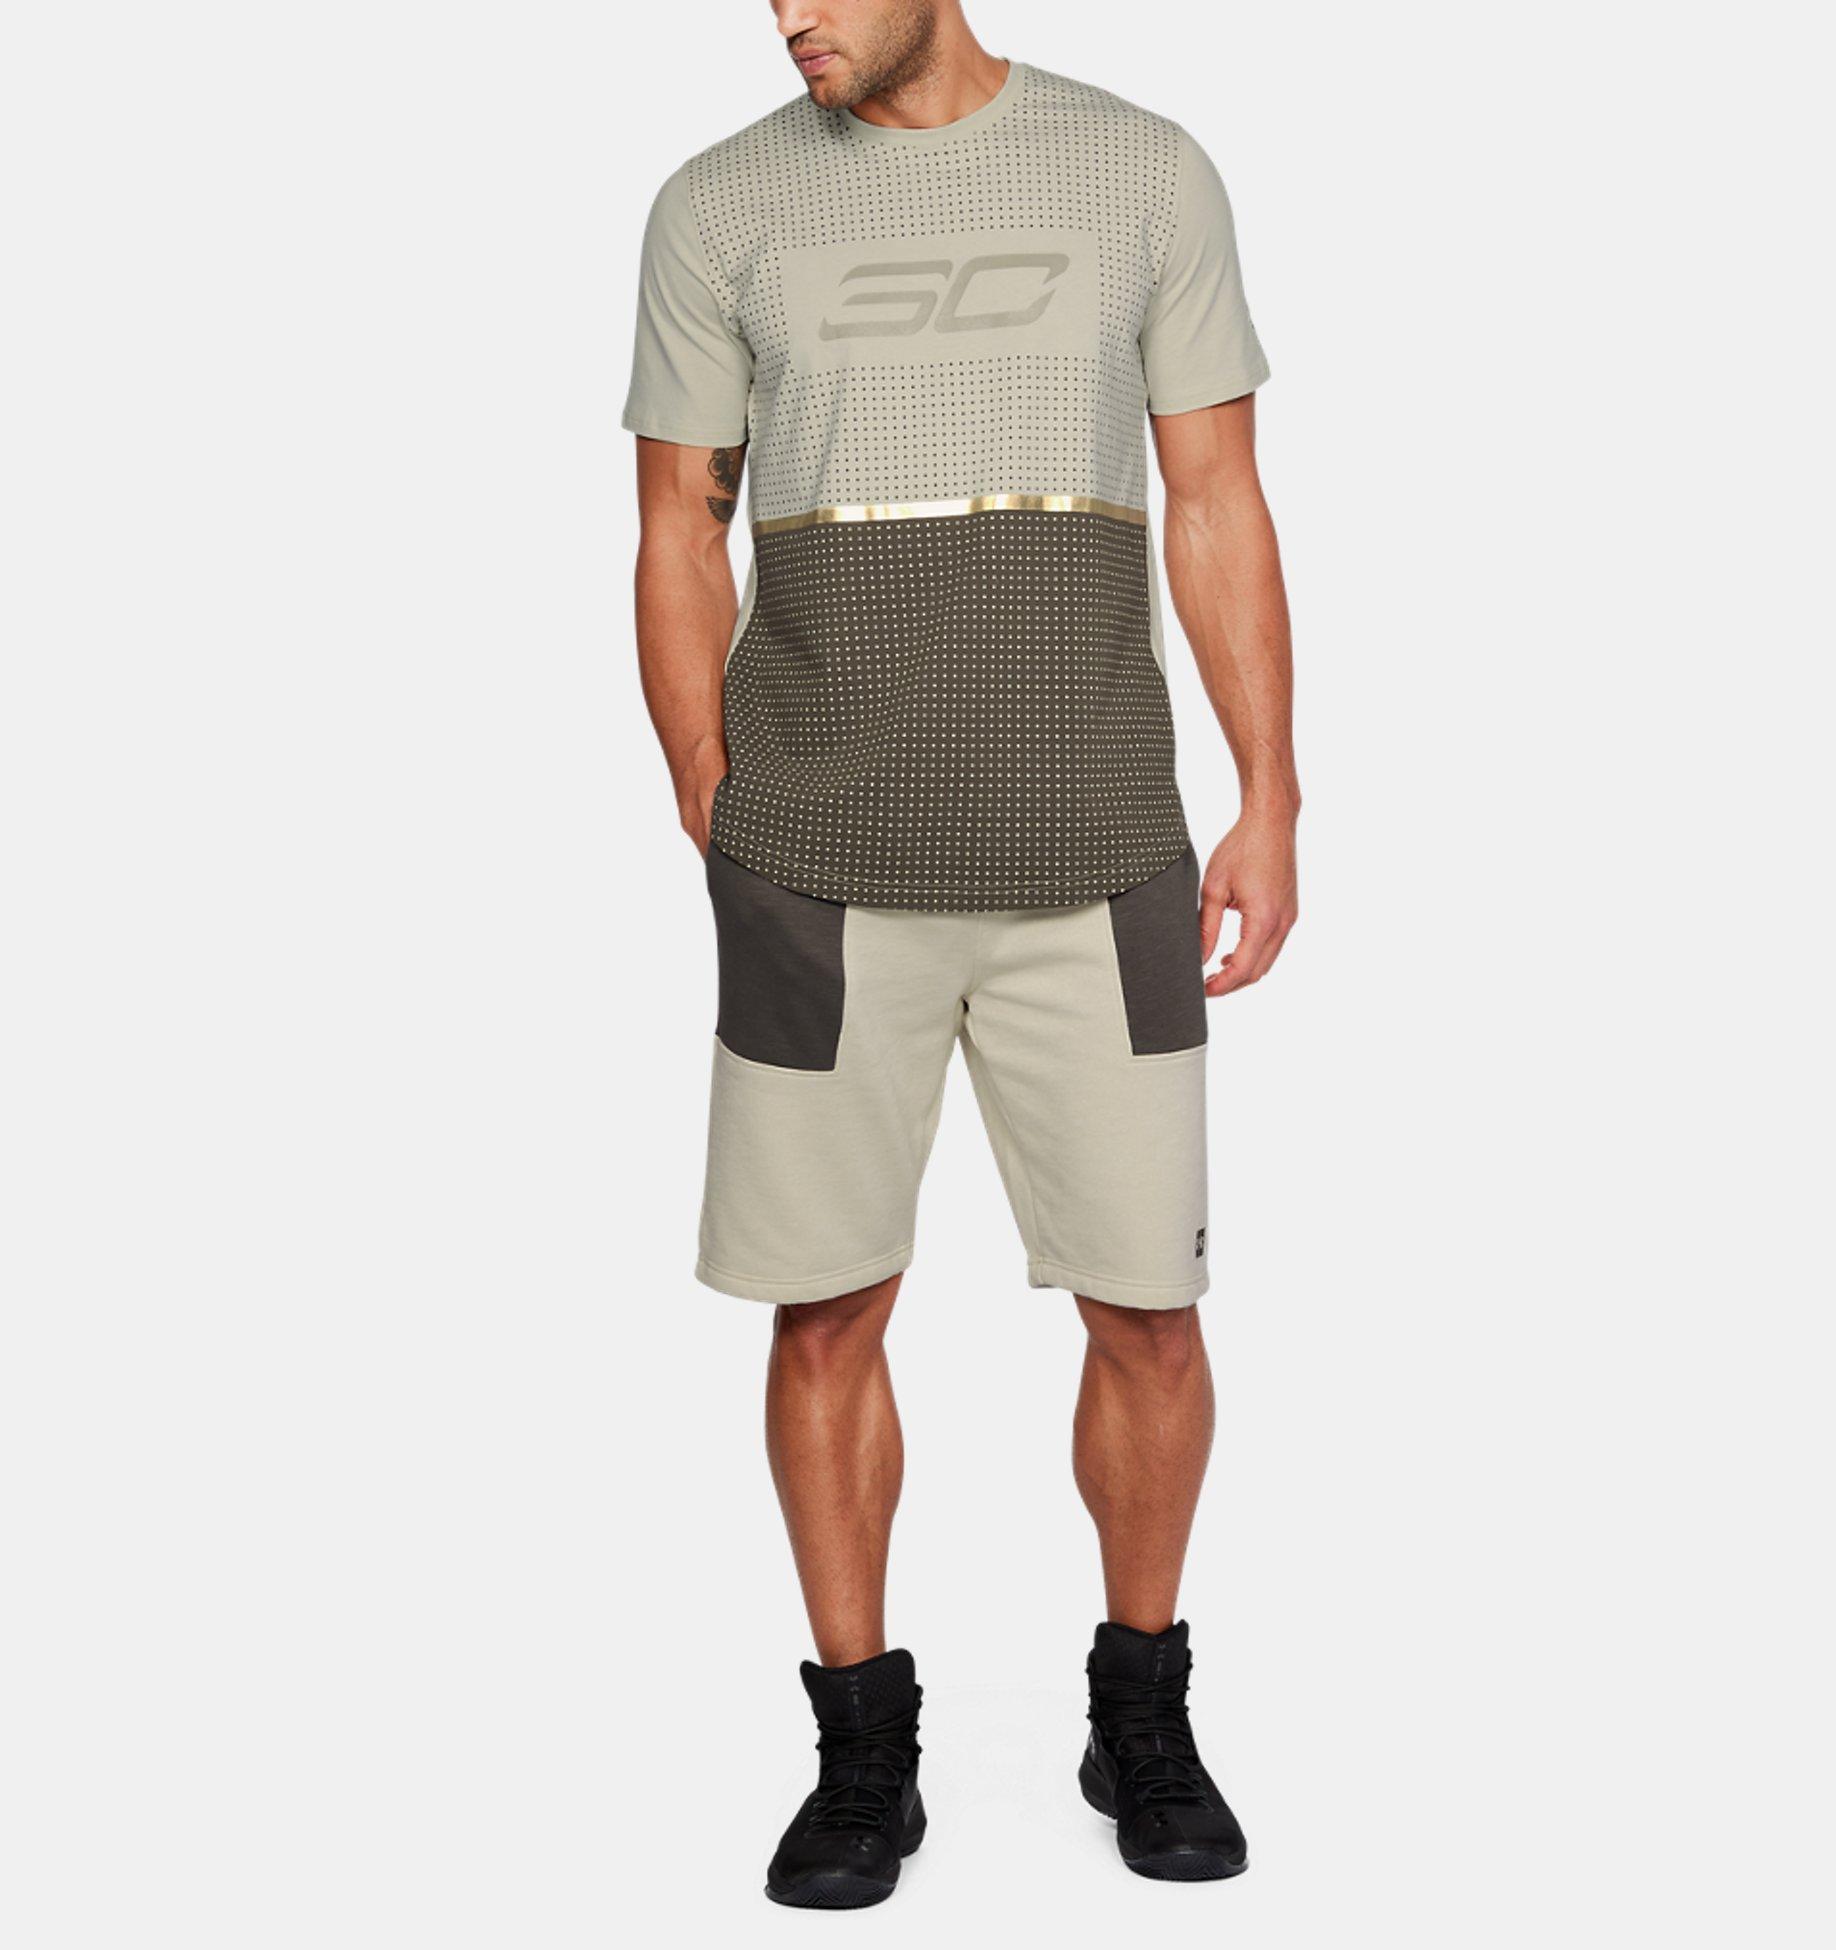 be699fd7d7 Camiseta SC30 Shersey Longline Masculina  Camiseta SC30 Shersey Longline  Masculina ...